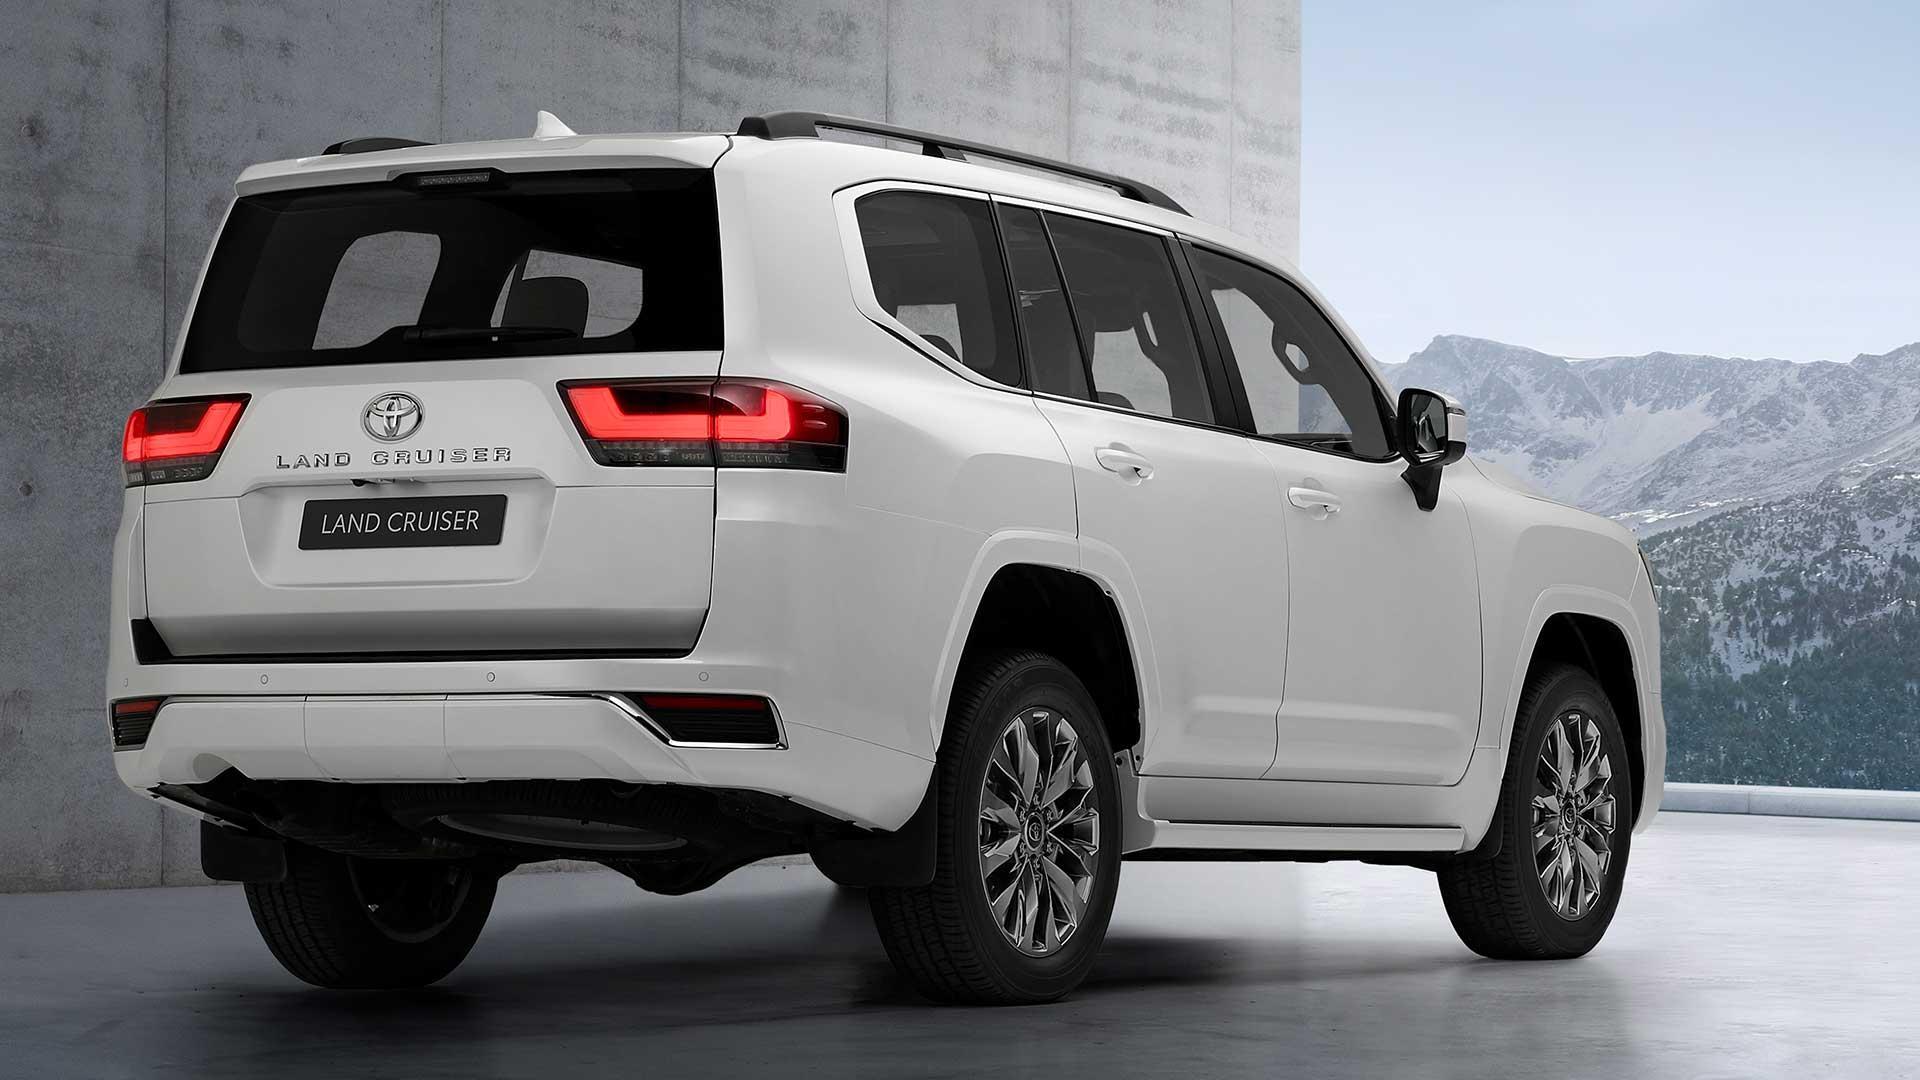 Achterkant Nieuwe Toyota Land Cruiser 300 (2021)